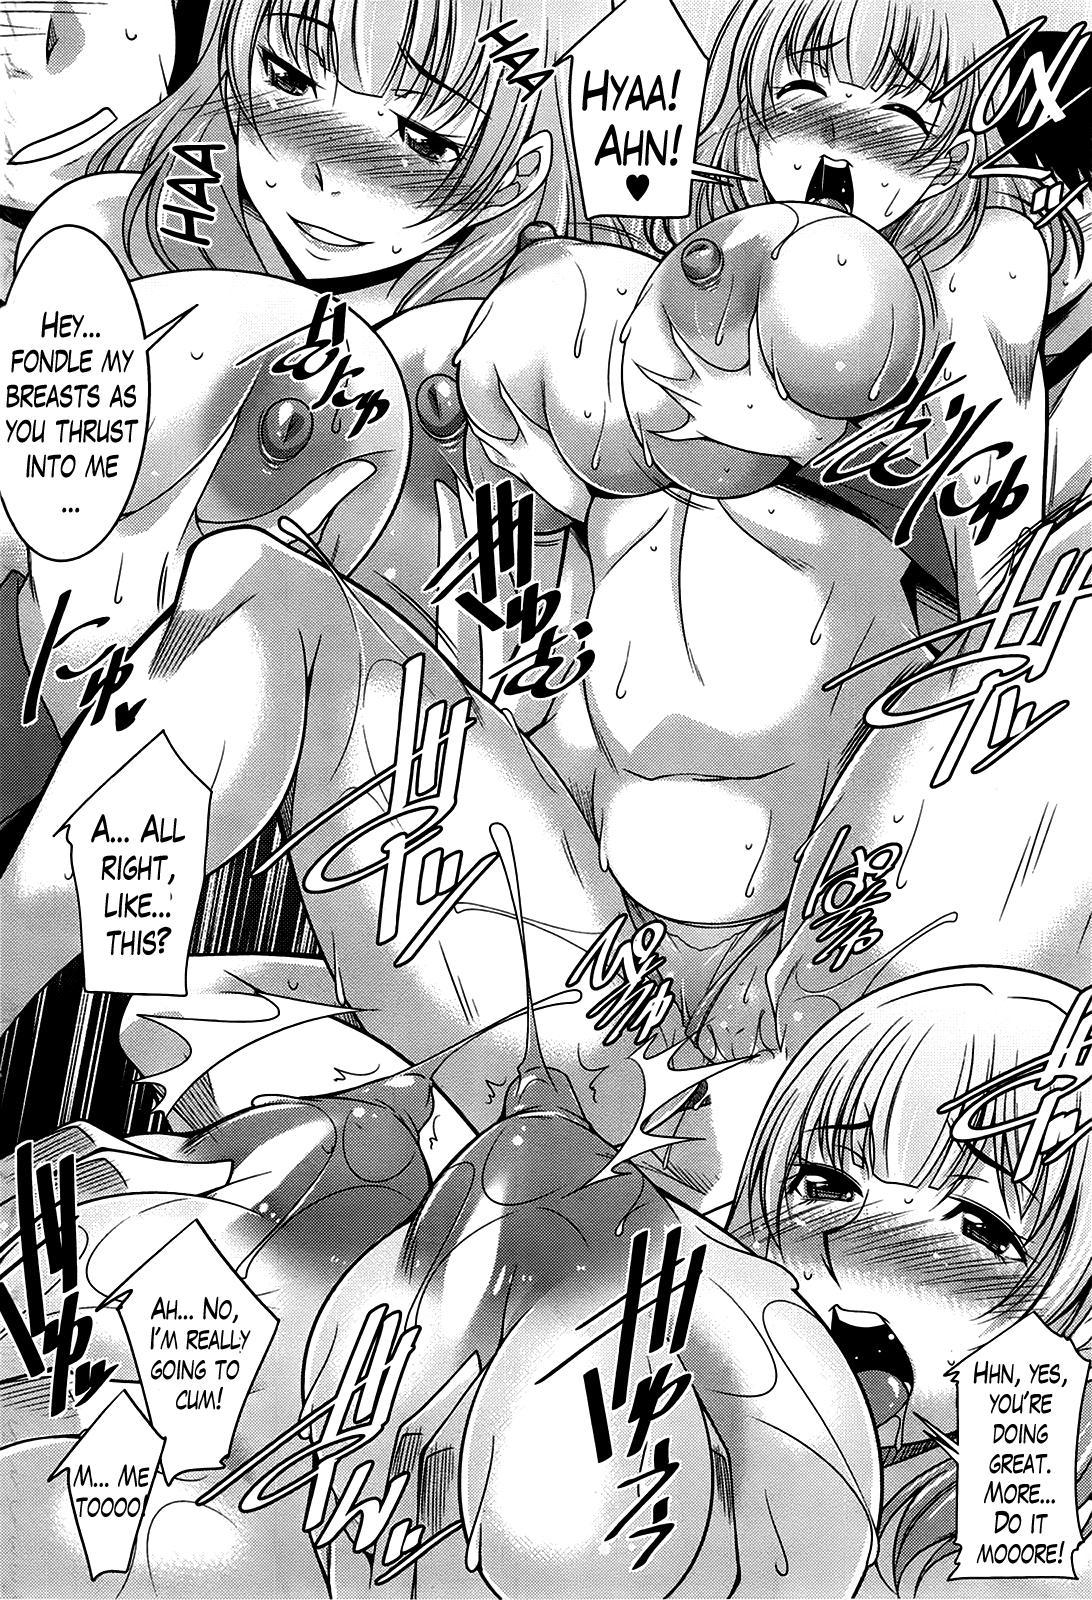 [Zen9] Taikutsu na Gogo no Sugoshikata Ch. 1-5   A Way to Spend a Boring Afternoon Ch. 1-5 (Action Pizazz DX 2013-12) [English](hentai2read.com)[Lazarus H] 35